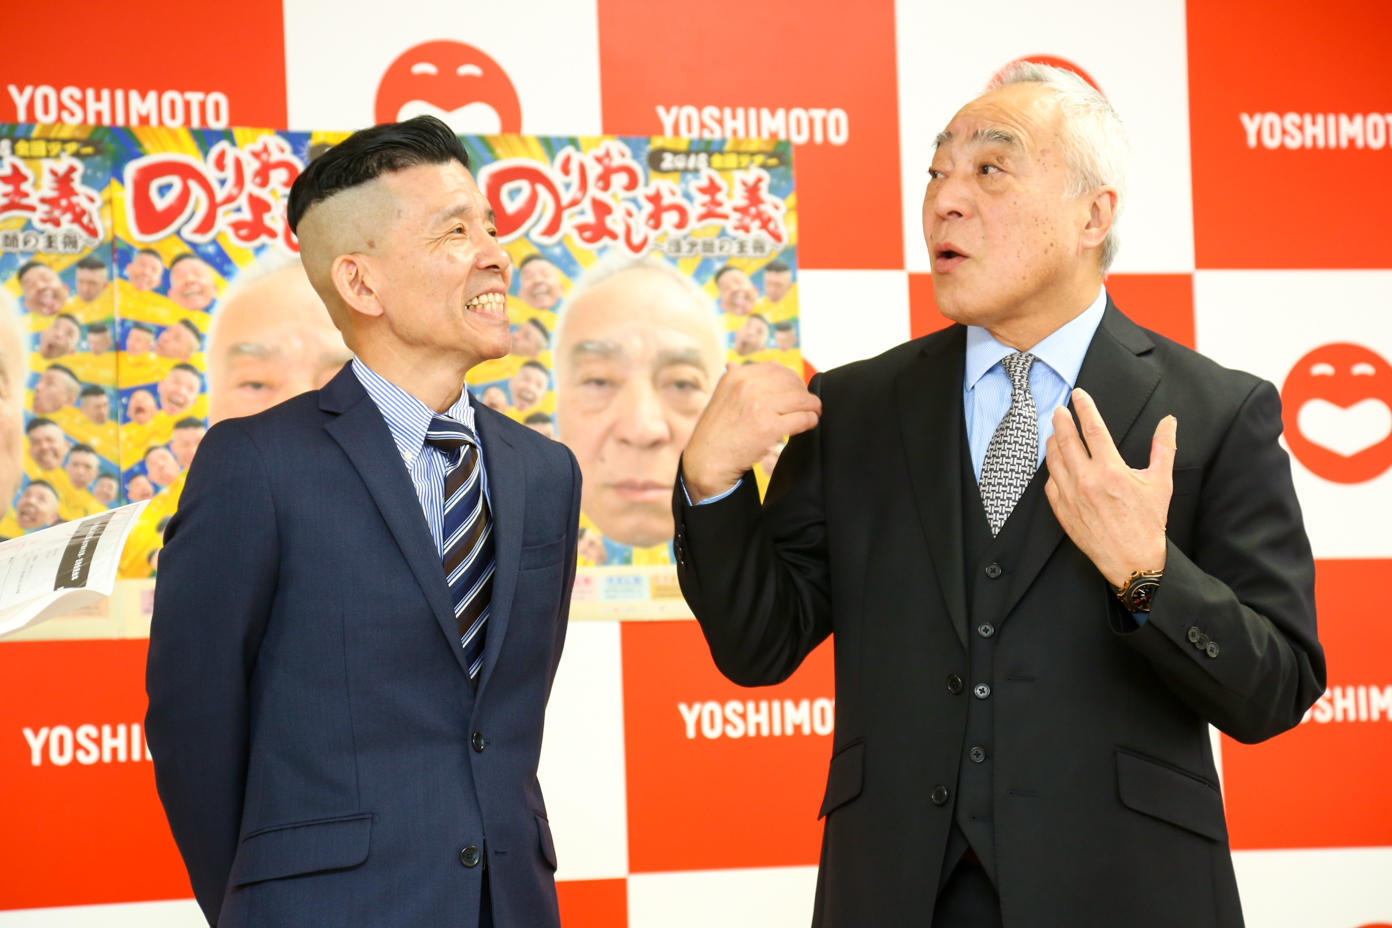 http://news.yoshimoto.co.jp/20171121230716-2669df067280e90c5ca9d545f77d6f9d9a2dfb1b.jpg